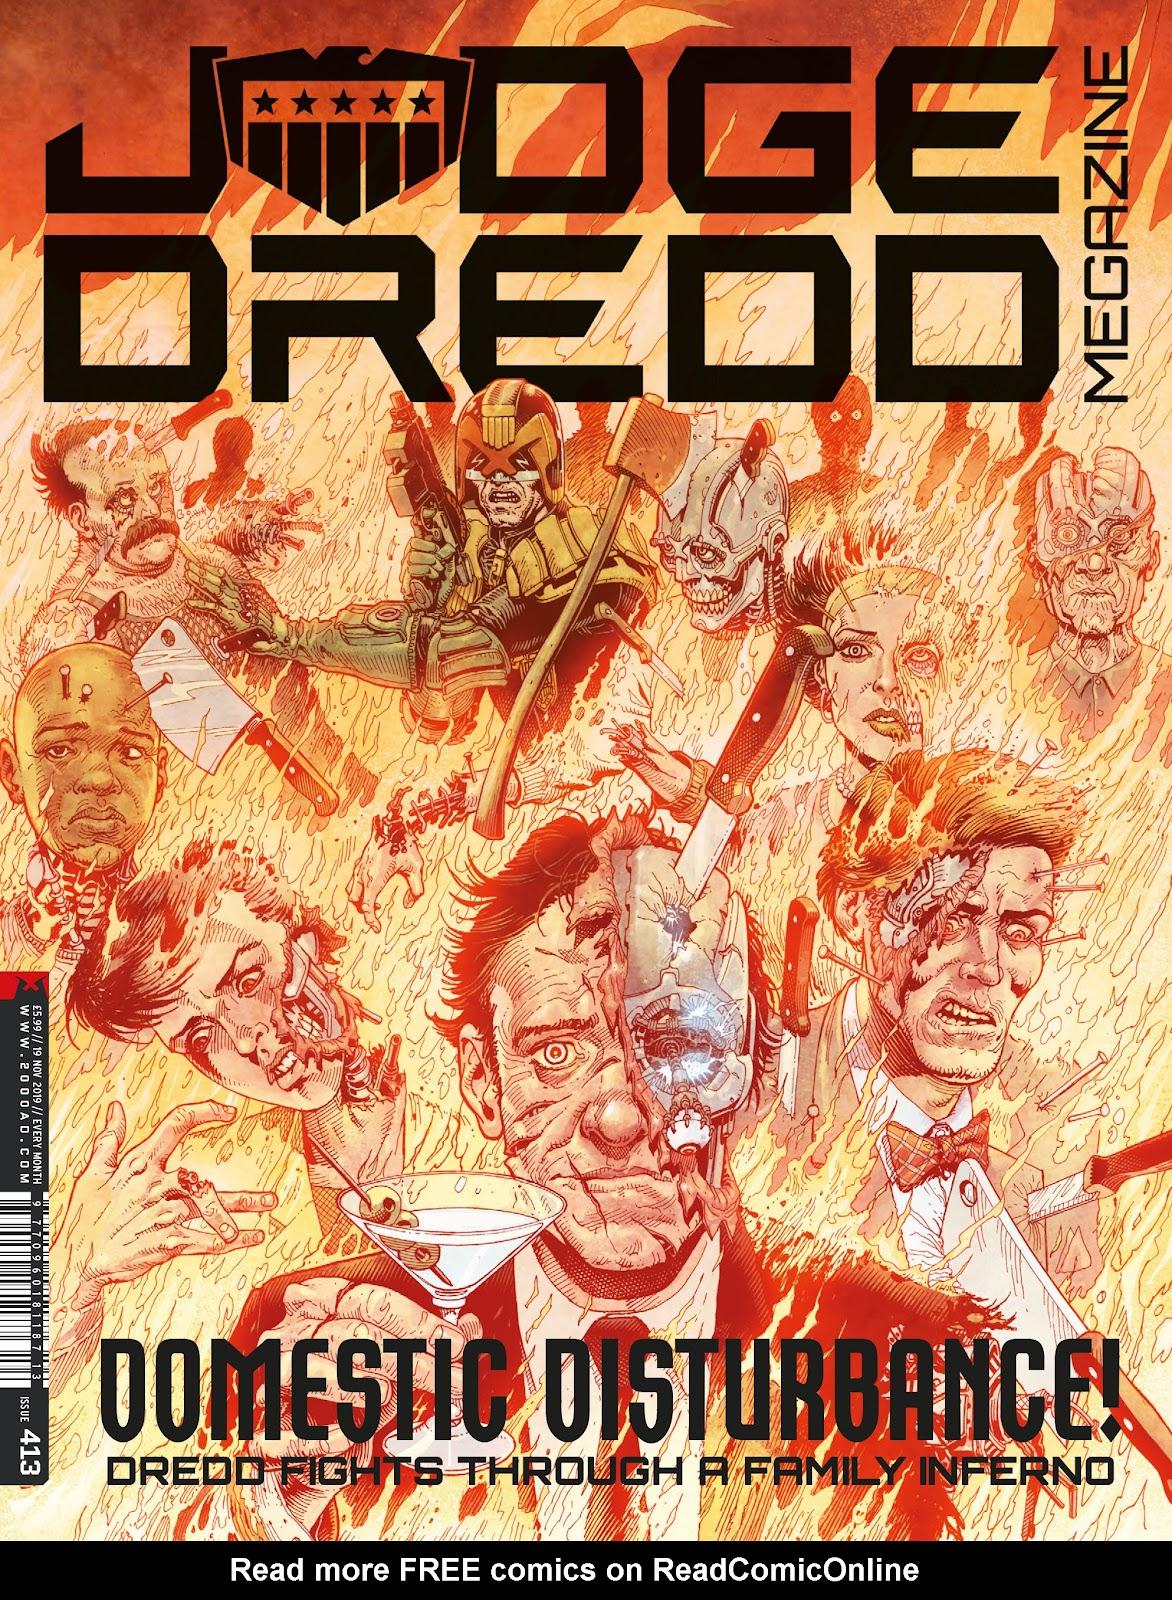 Judge Dredd Megazine (Vol. 5) issue 413 - Page 1